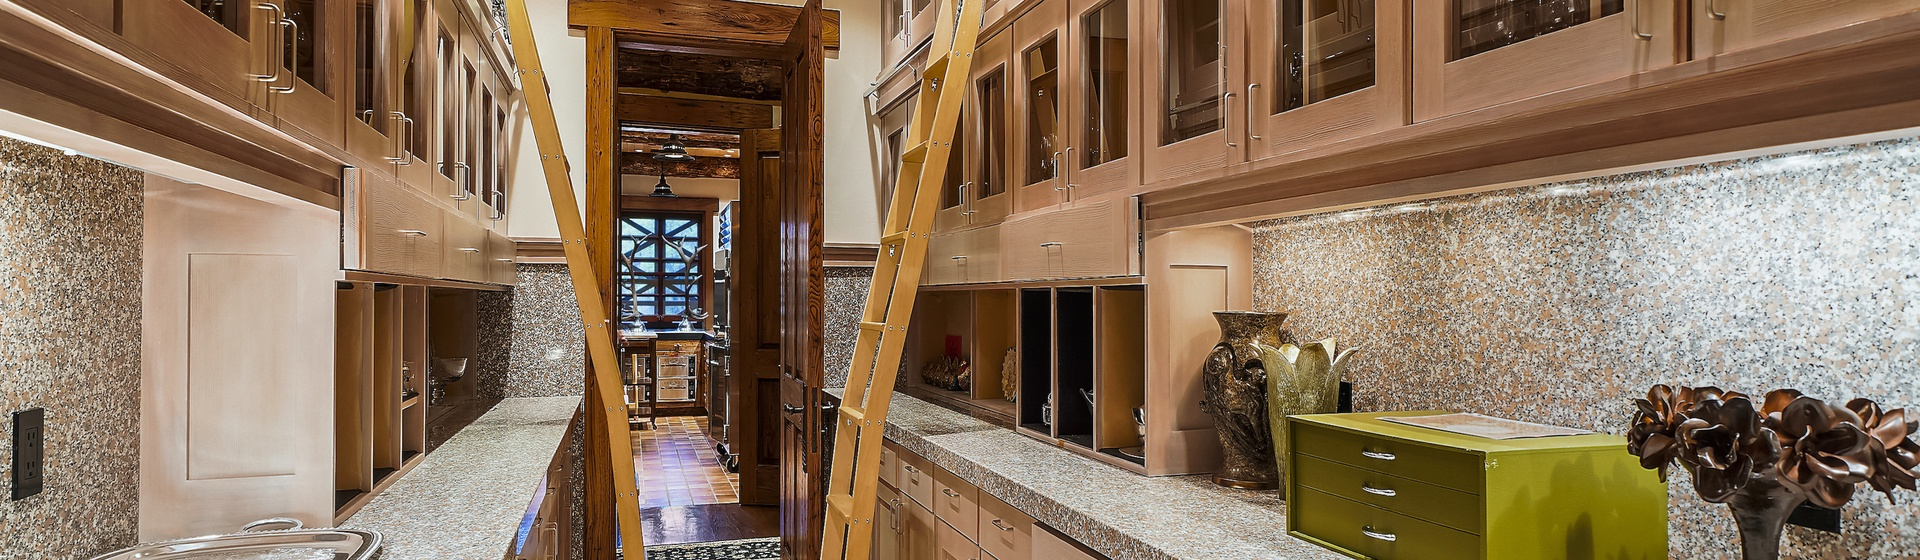 11.3-Telluride-Sleeping-Indian-Ranch-prep-kitchen-storage-room-web.JPG